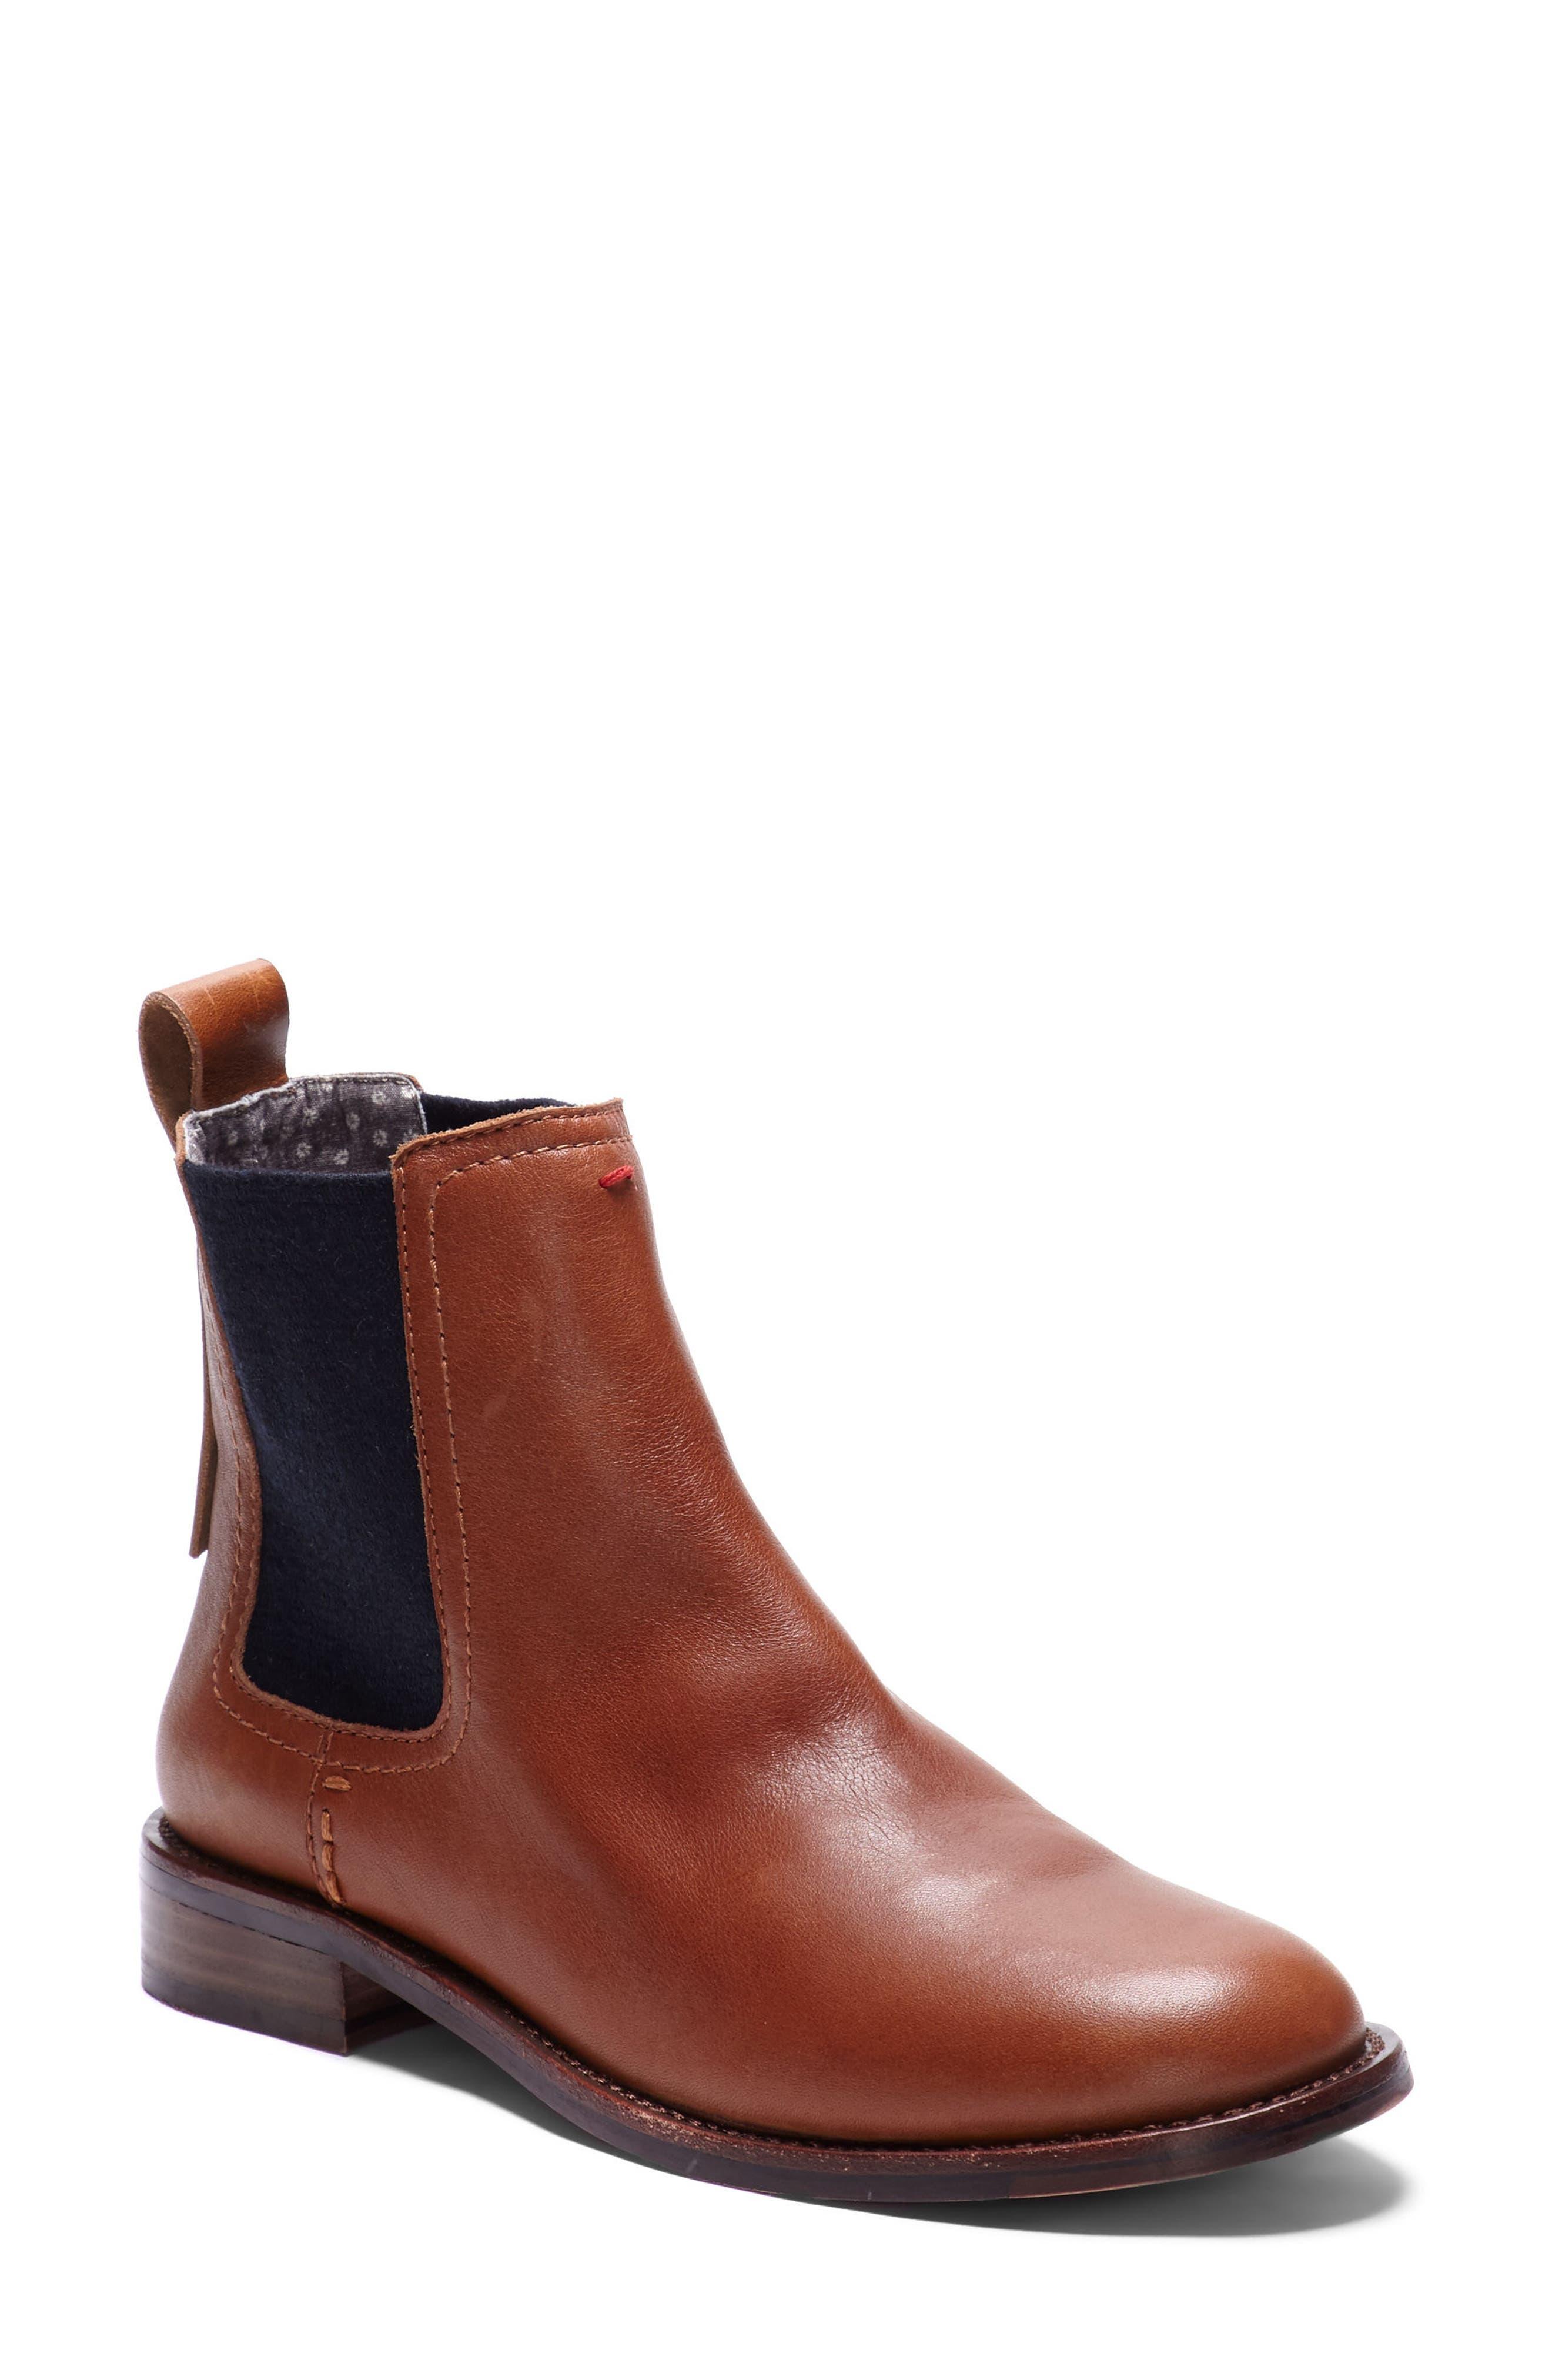 Zabi Chelsea Boot,                         Main,                         color, 241